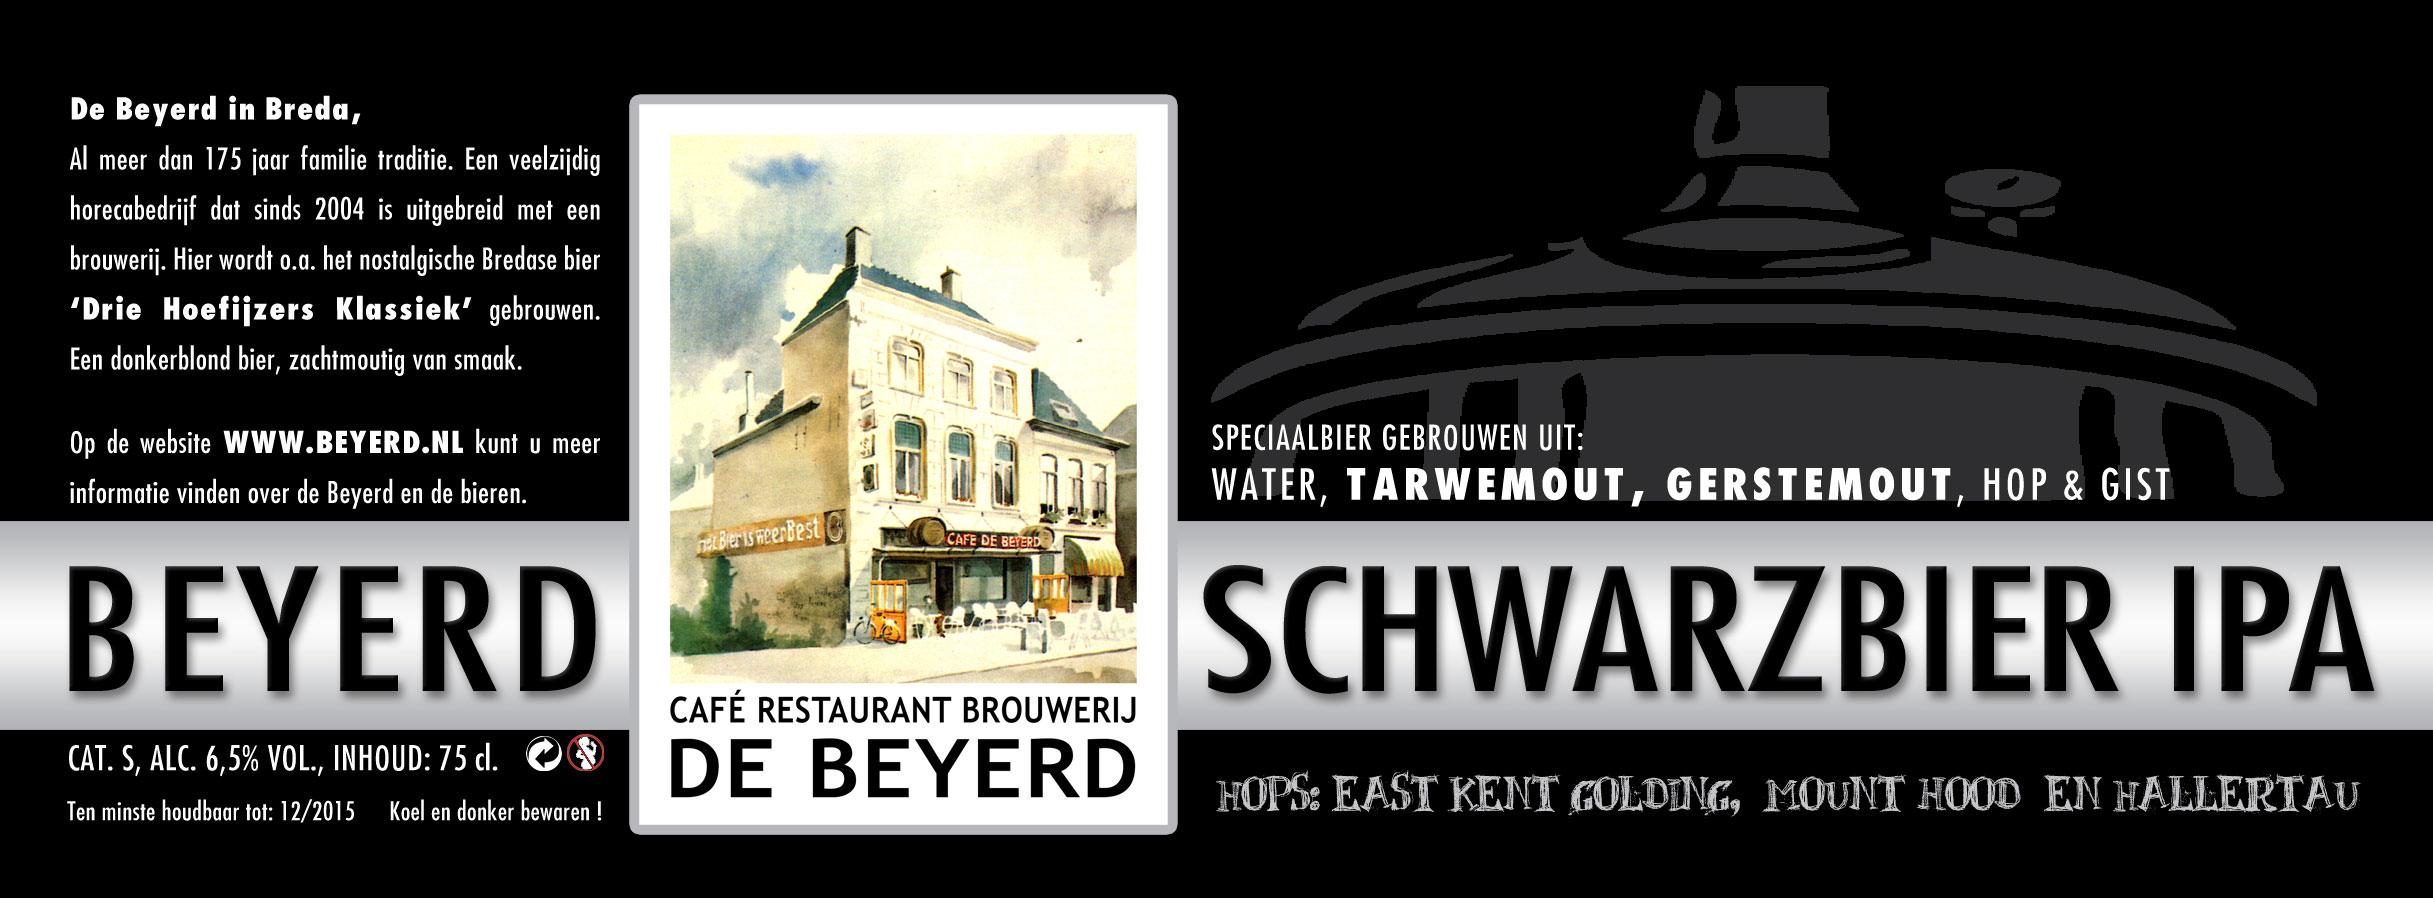 00-Etiketten-2015-Schwarzbier-IPA